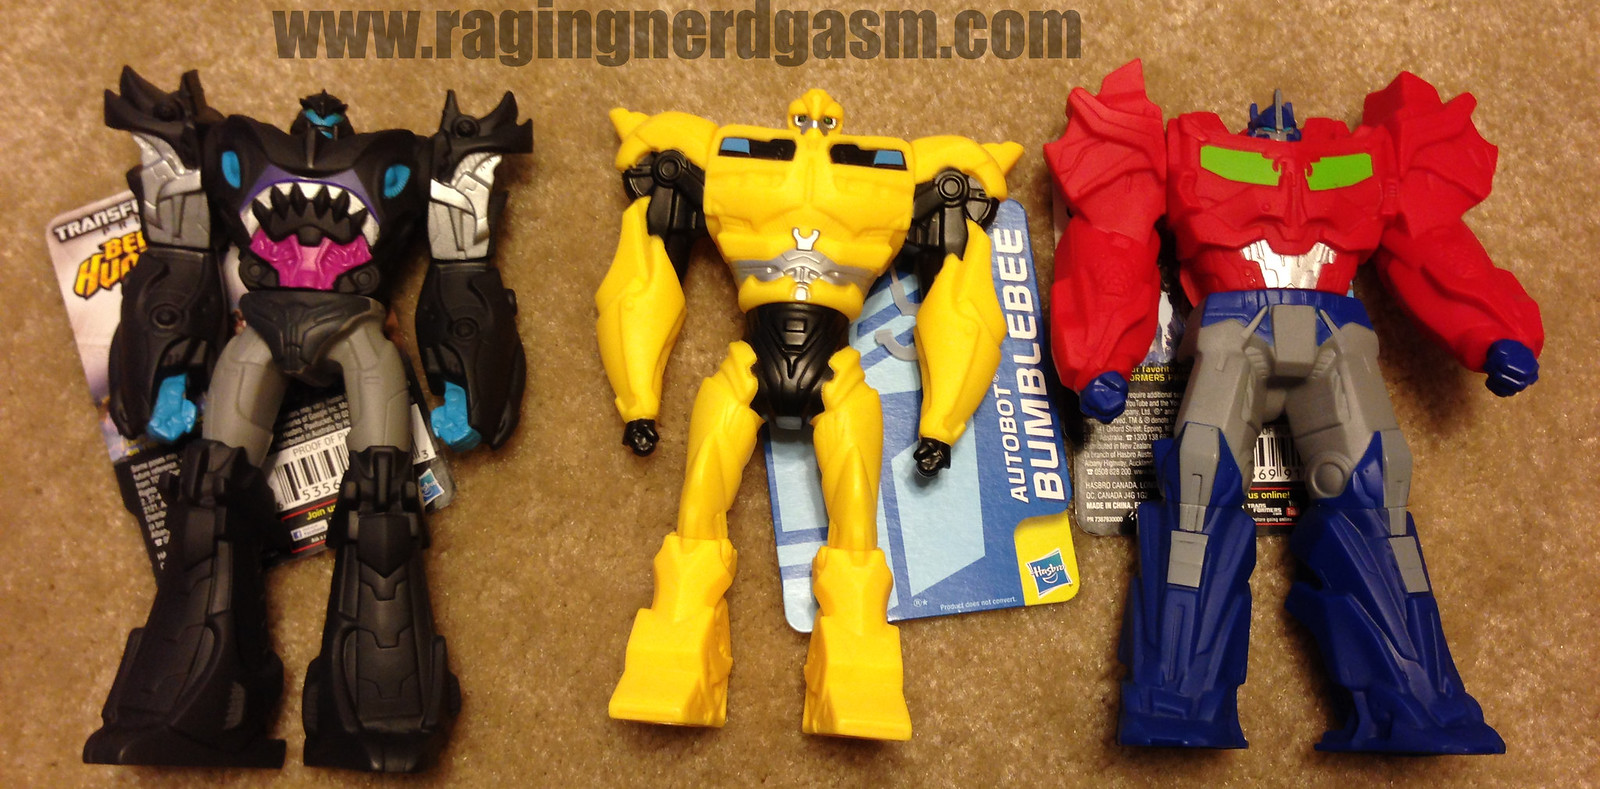 Transformers American Sifubi figures Megatron Bumblebee Optimus Prime - beast hunters